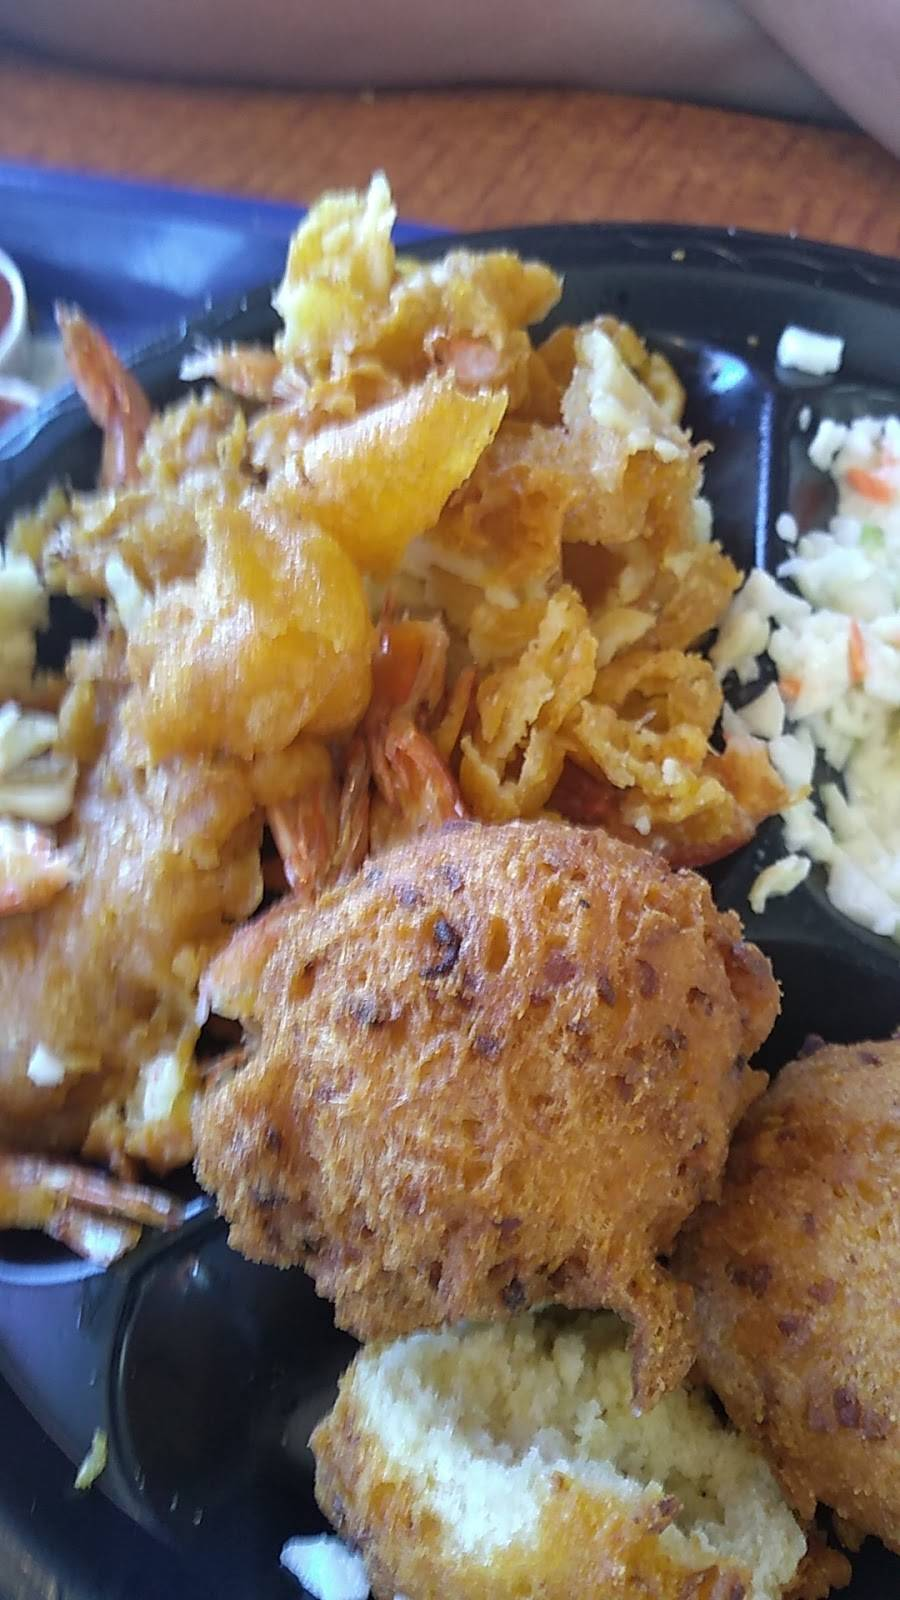 Long John Silvers - restaurant    Photo 1 of 4   Address: 4480 Alum Creek Dr, Obetz, OH 43207, USA   Phone: (614) 492-9021